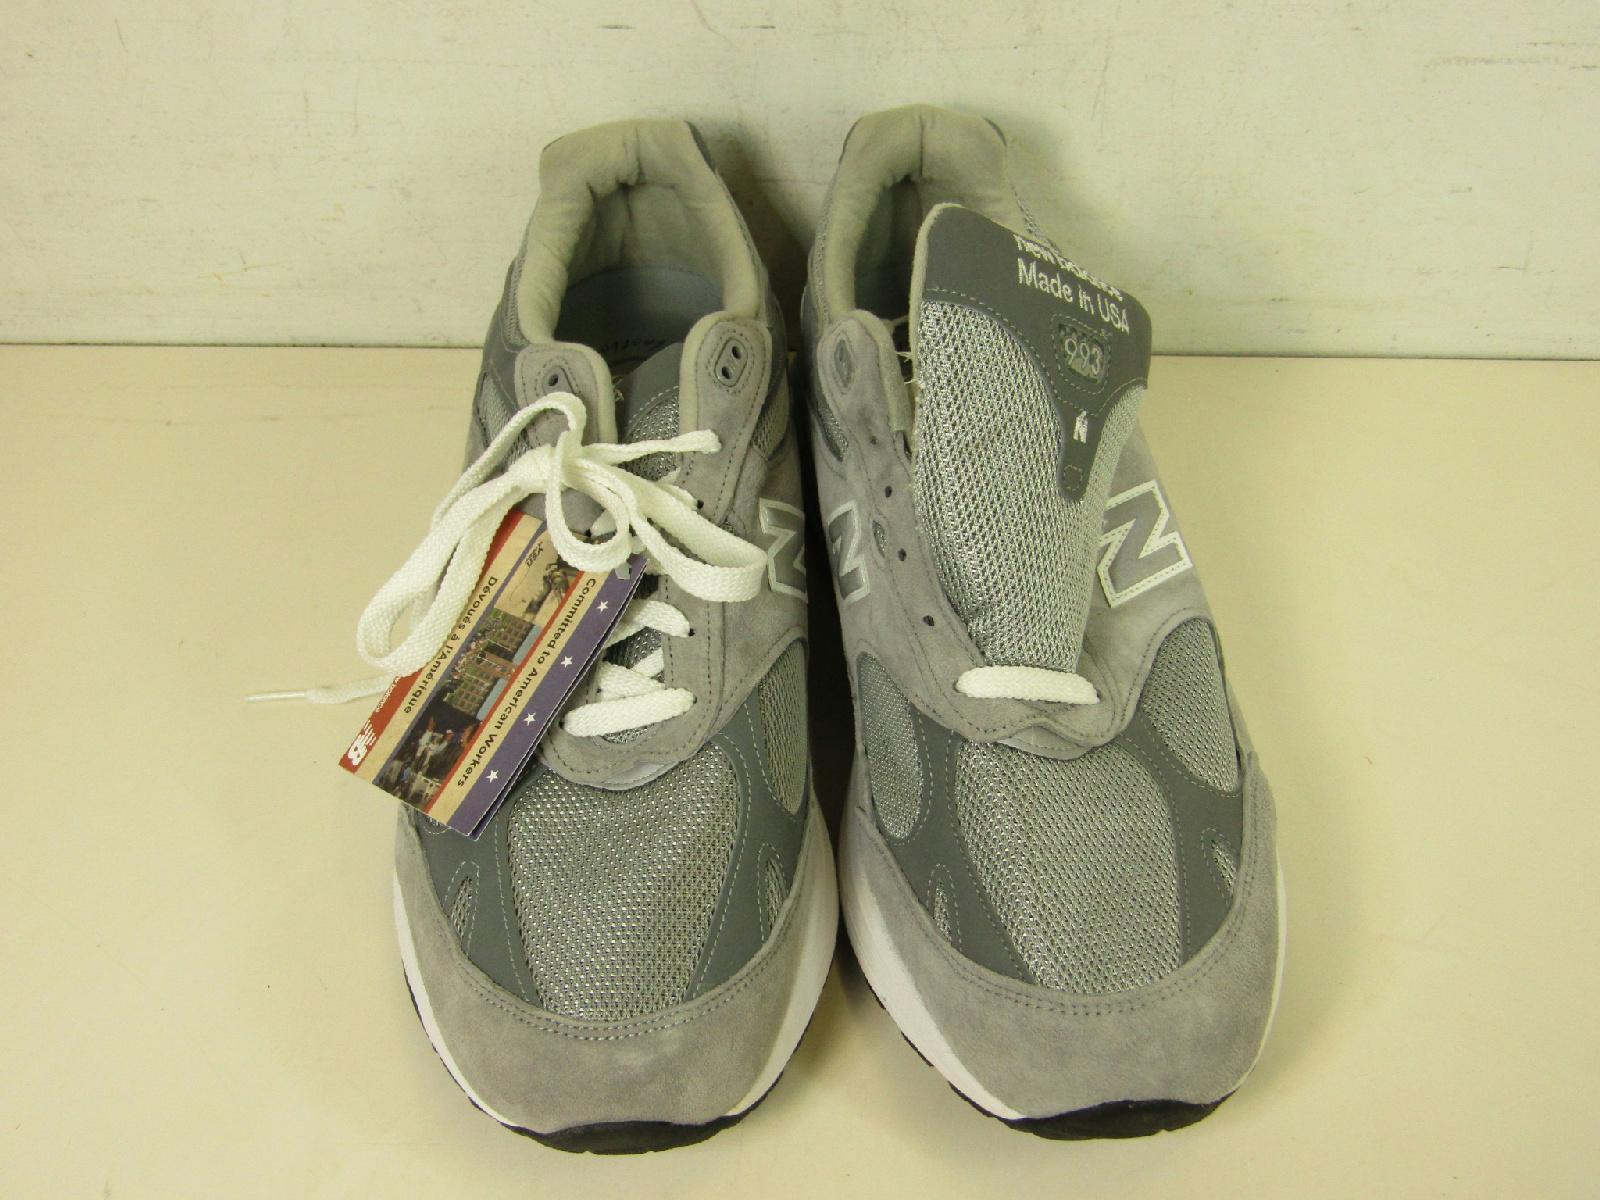 Mizuno Running Shoes Albuquerque